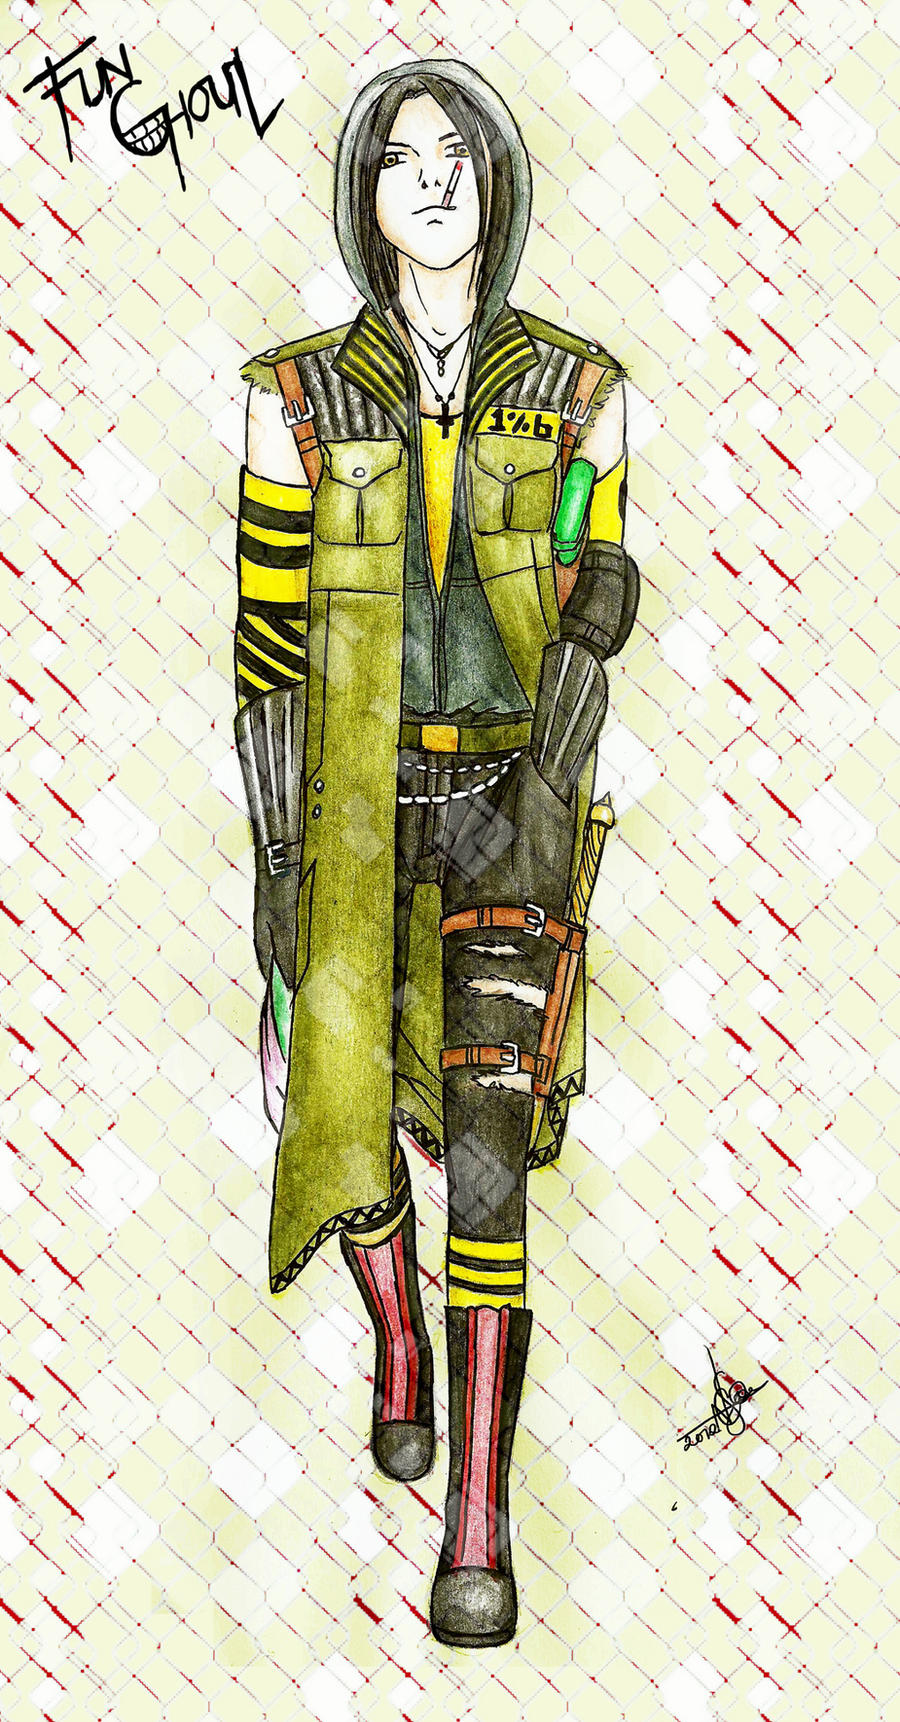 Fun Ghoul costume design by NadzEscapade